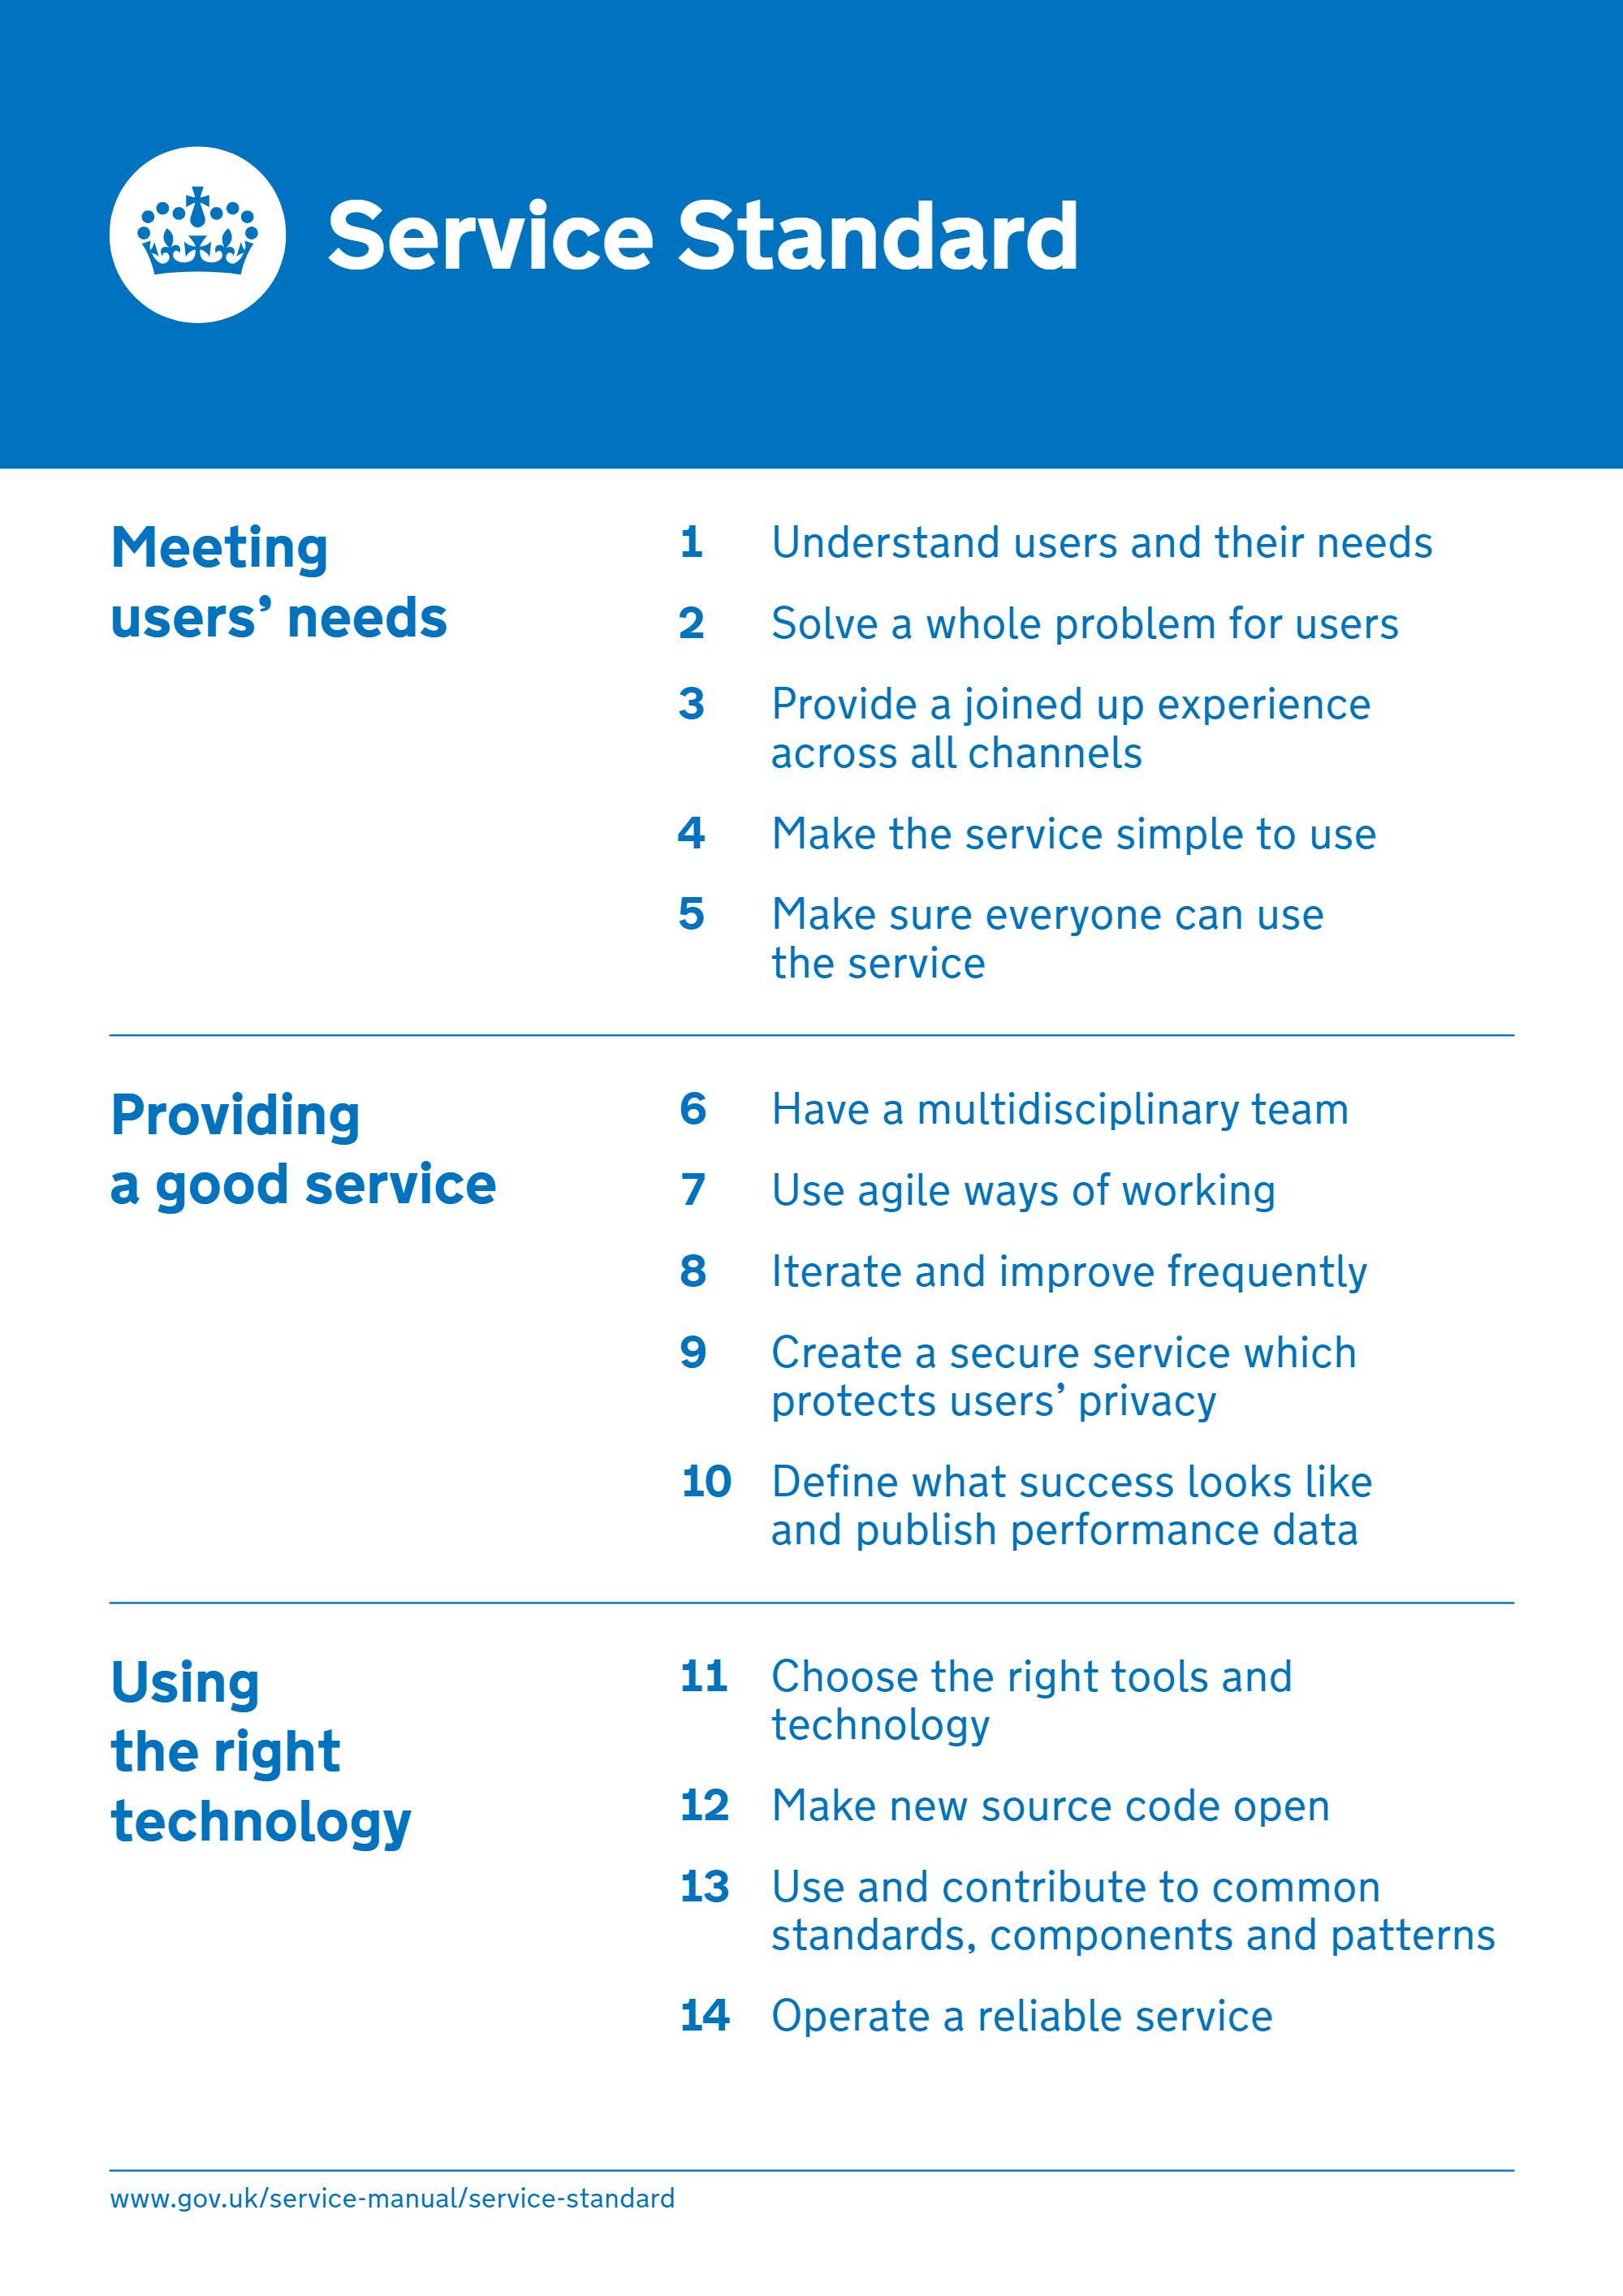 GOV.UK Service Standard